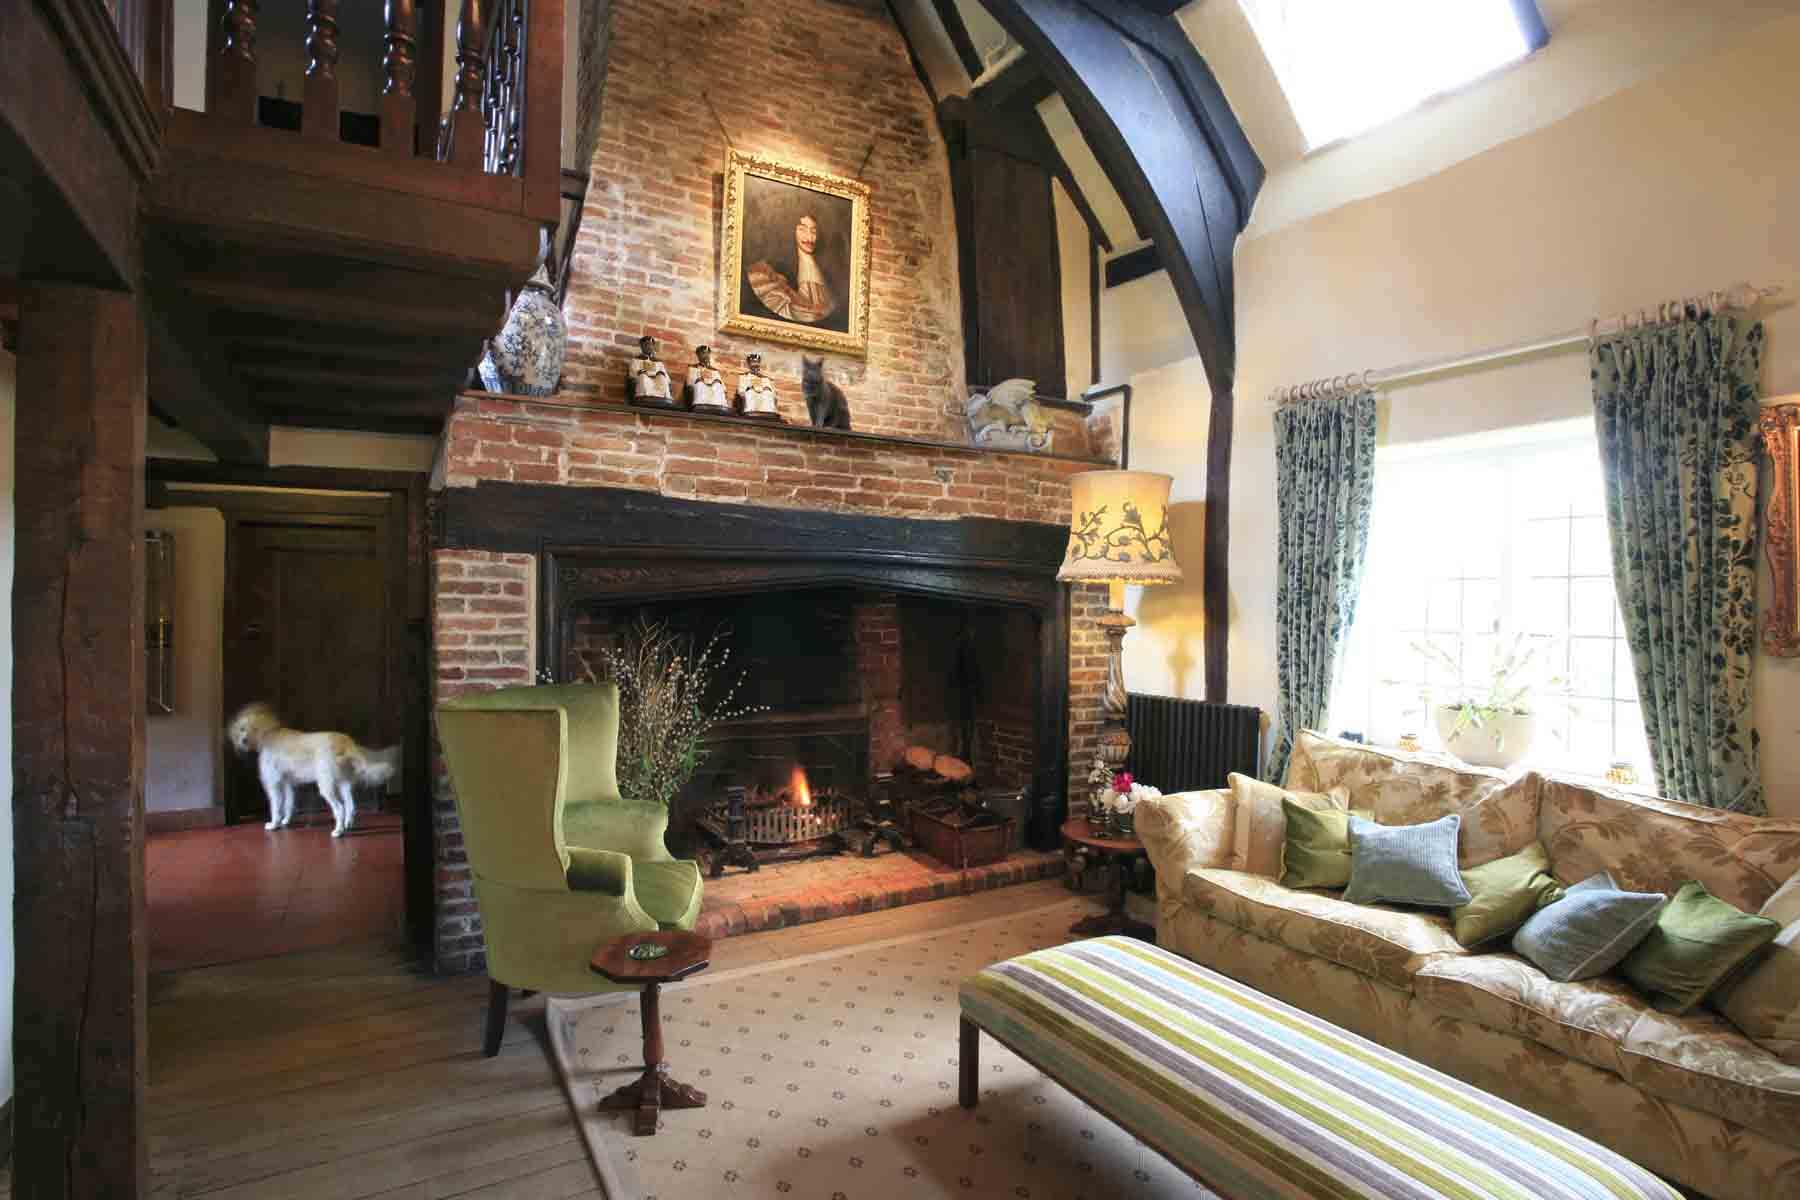 Carol_Fulton_Photography_traditional_interiors__003.jpg